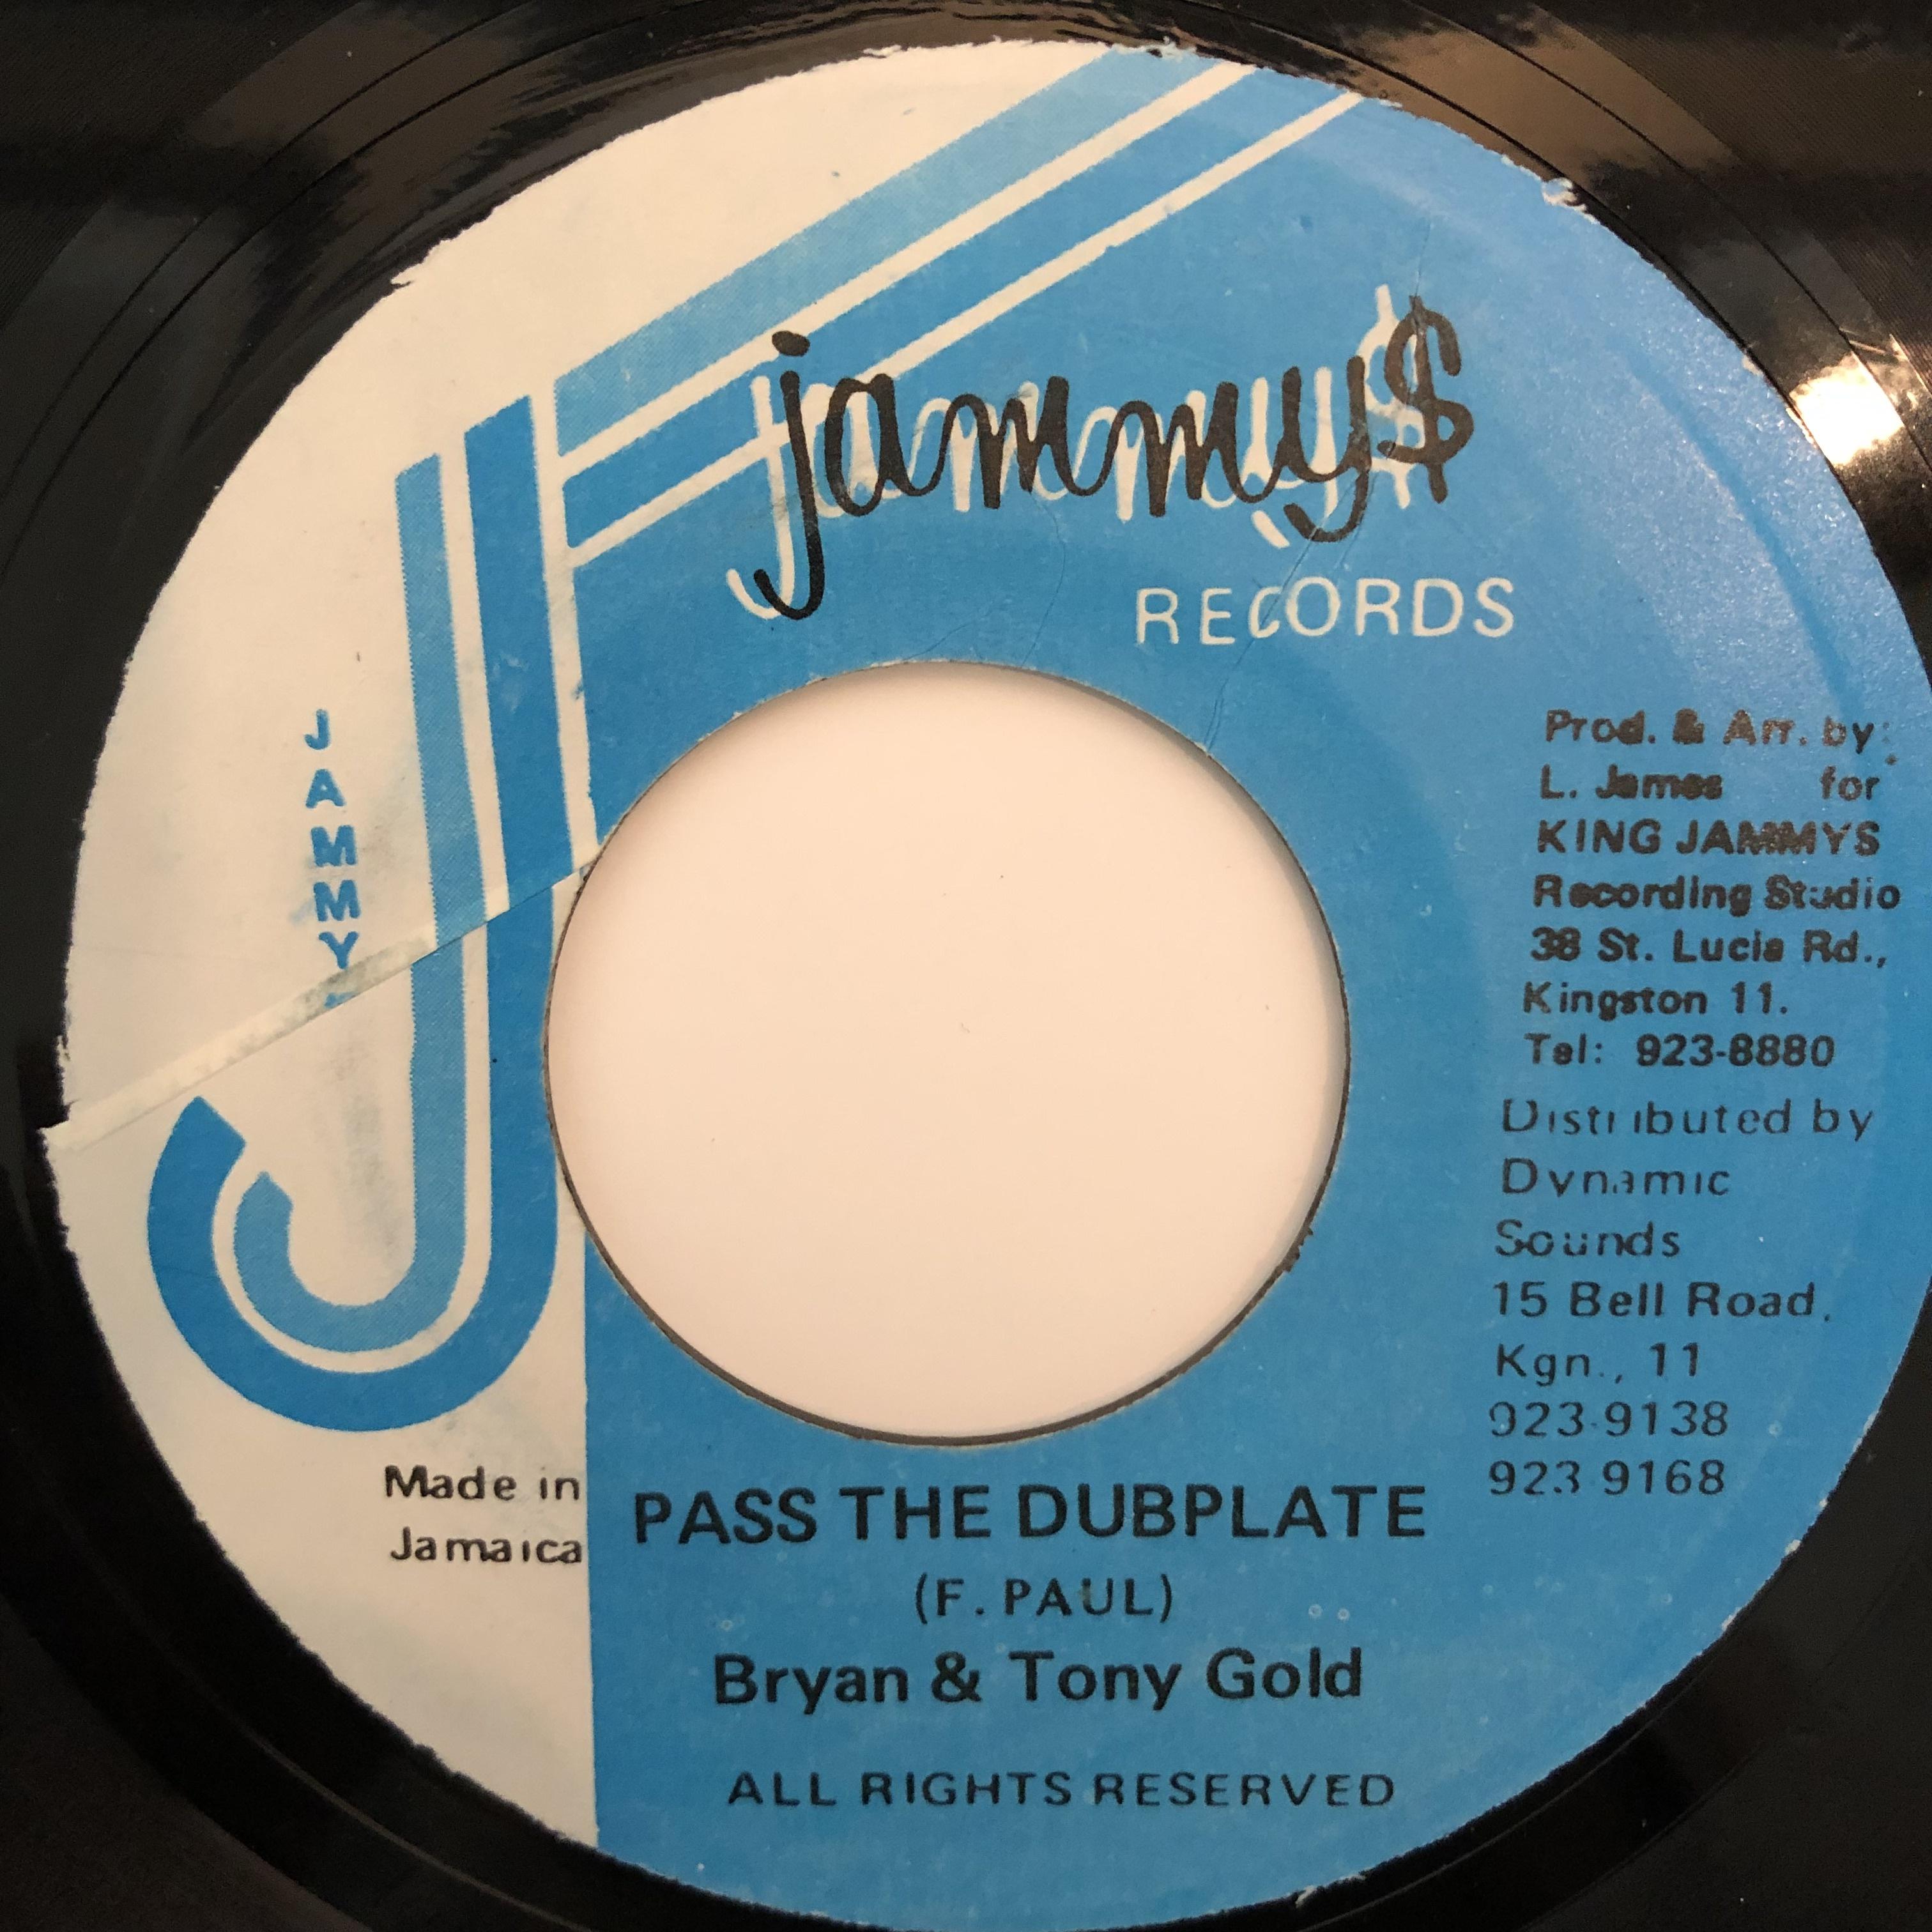 Brian & Tony Gold - Pass The Dubplate【7-20312】